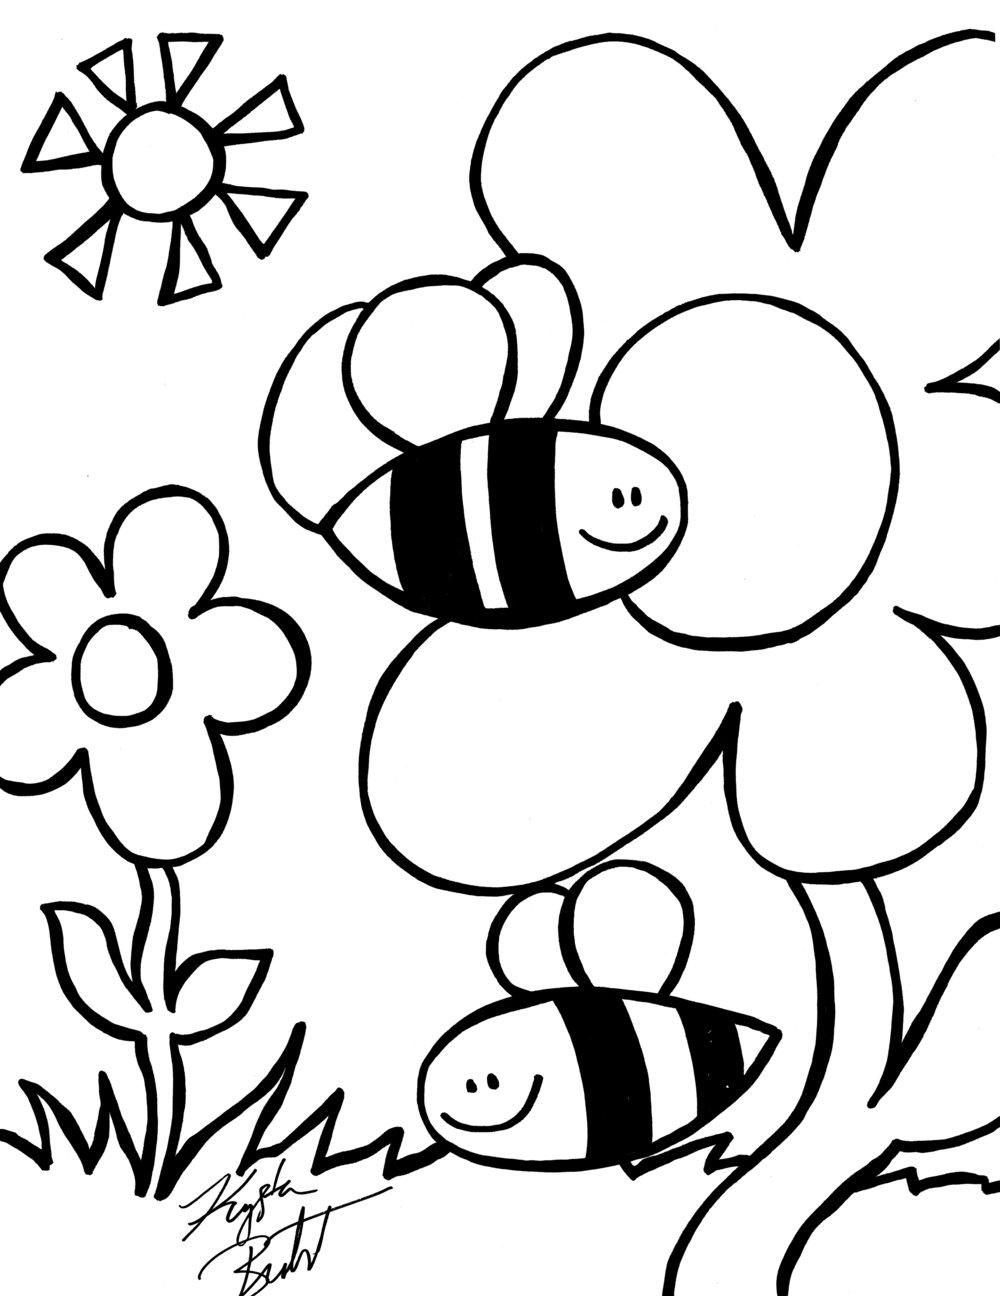 B_Bees.jpg